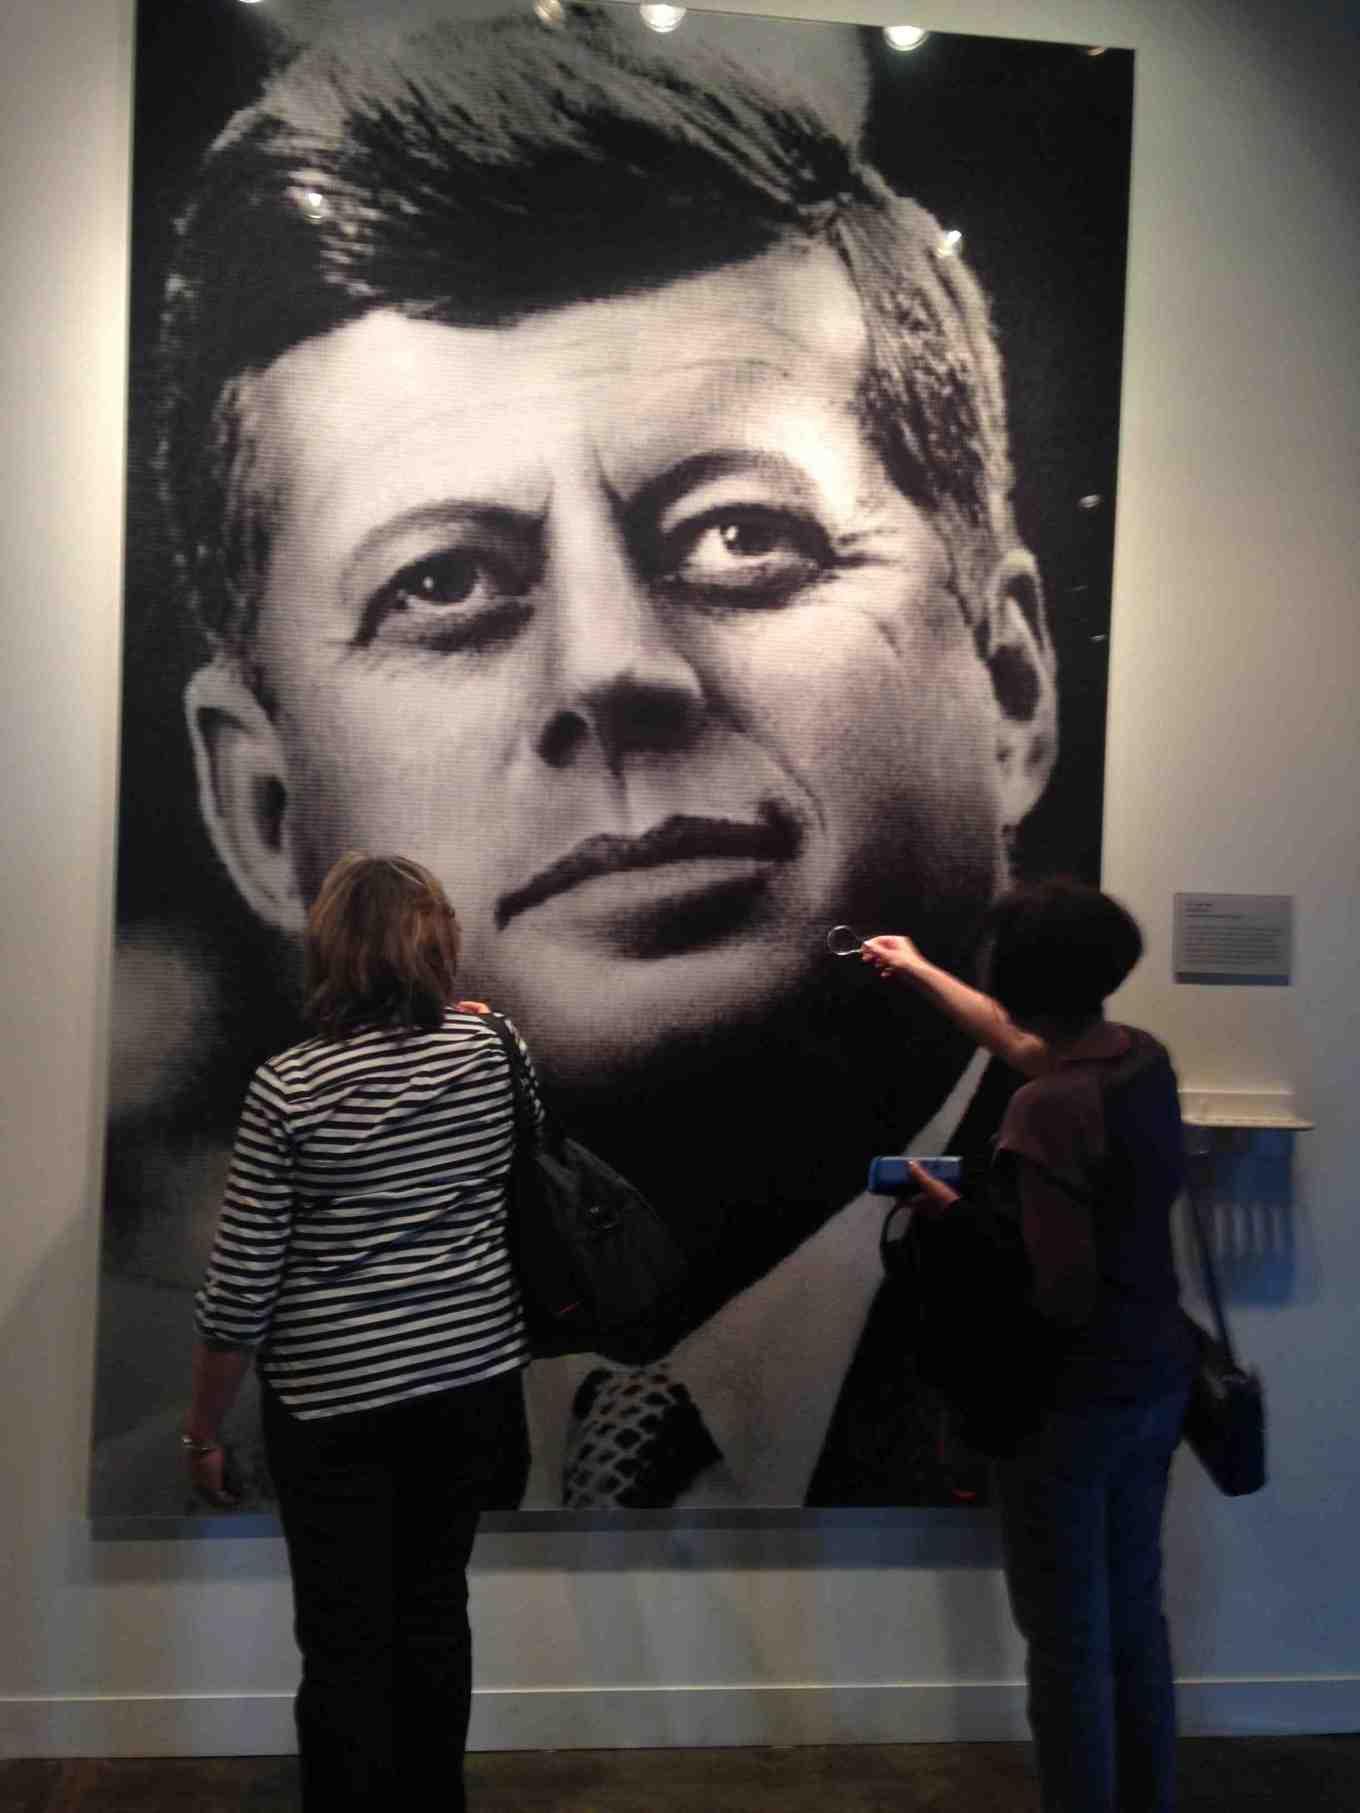 JFK ART